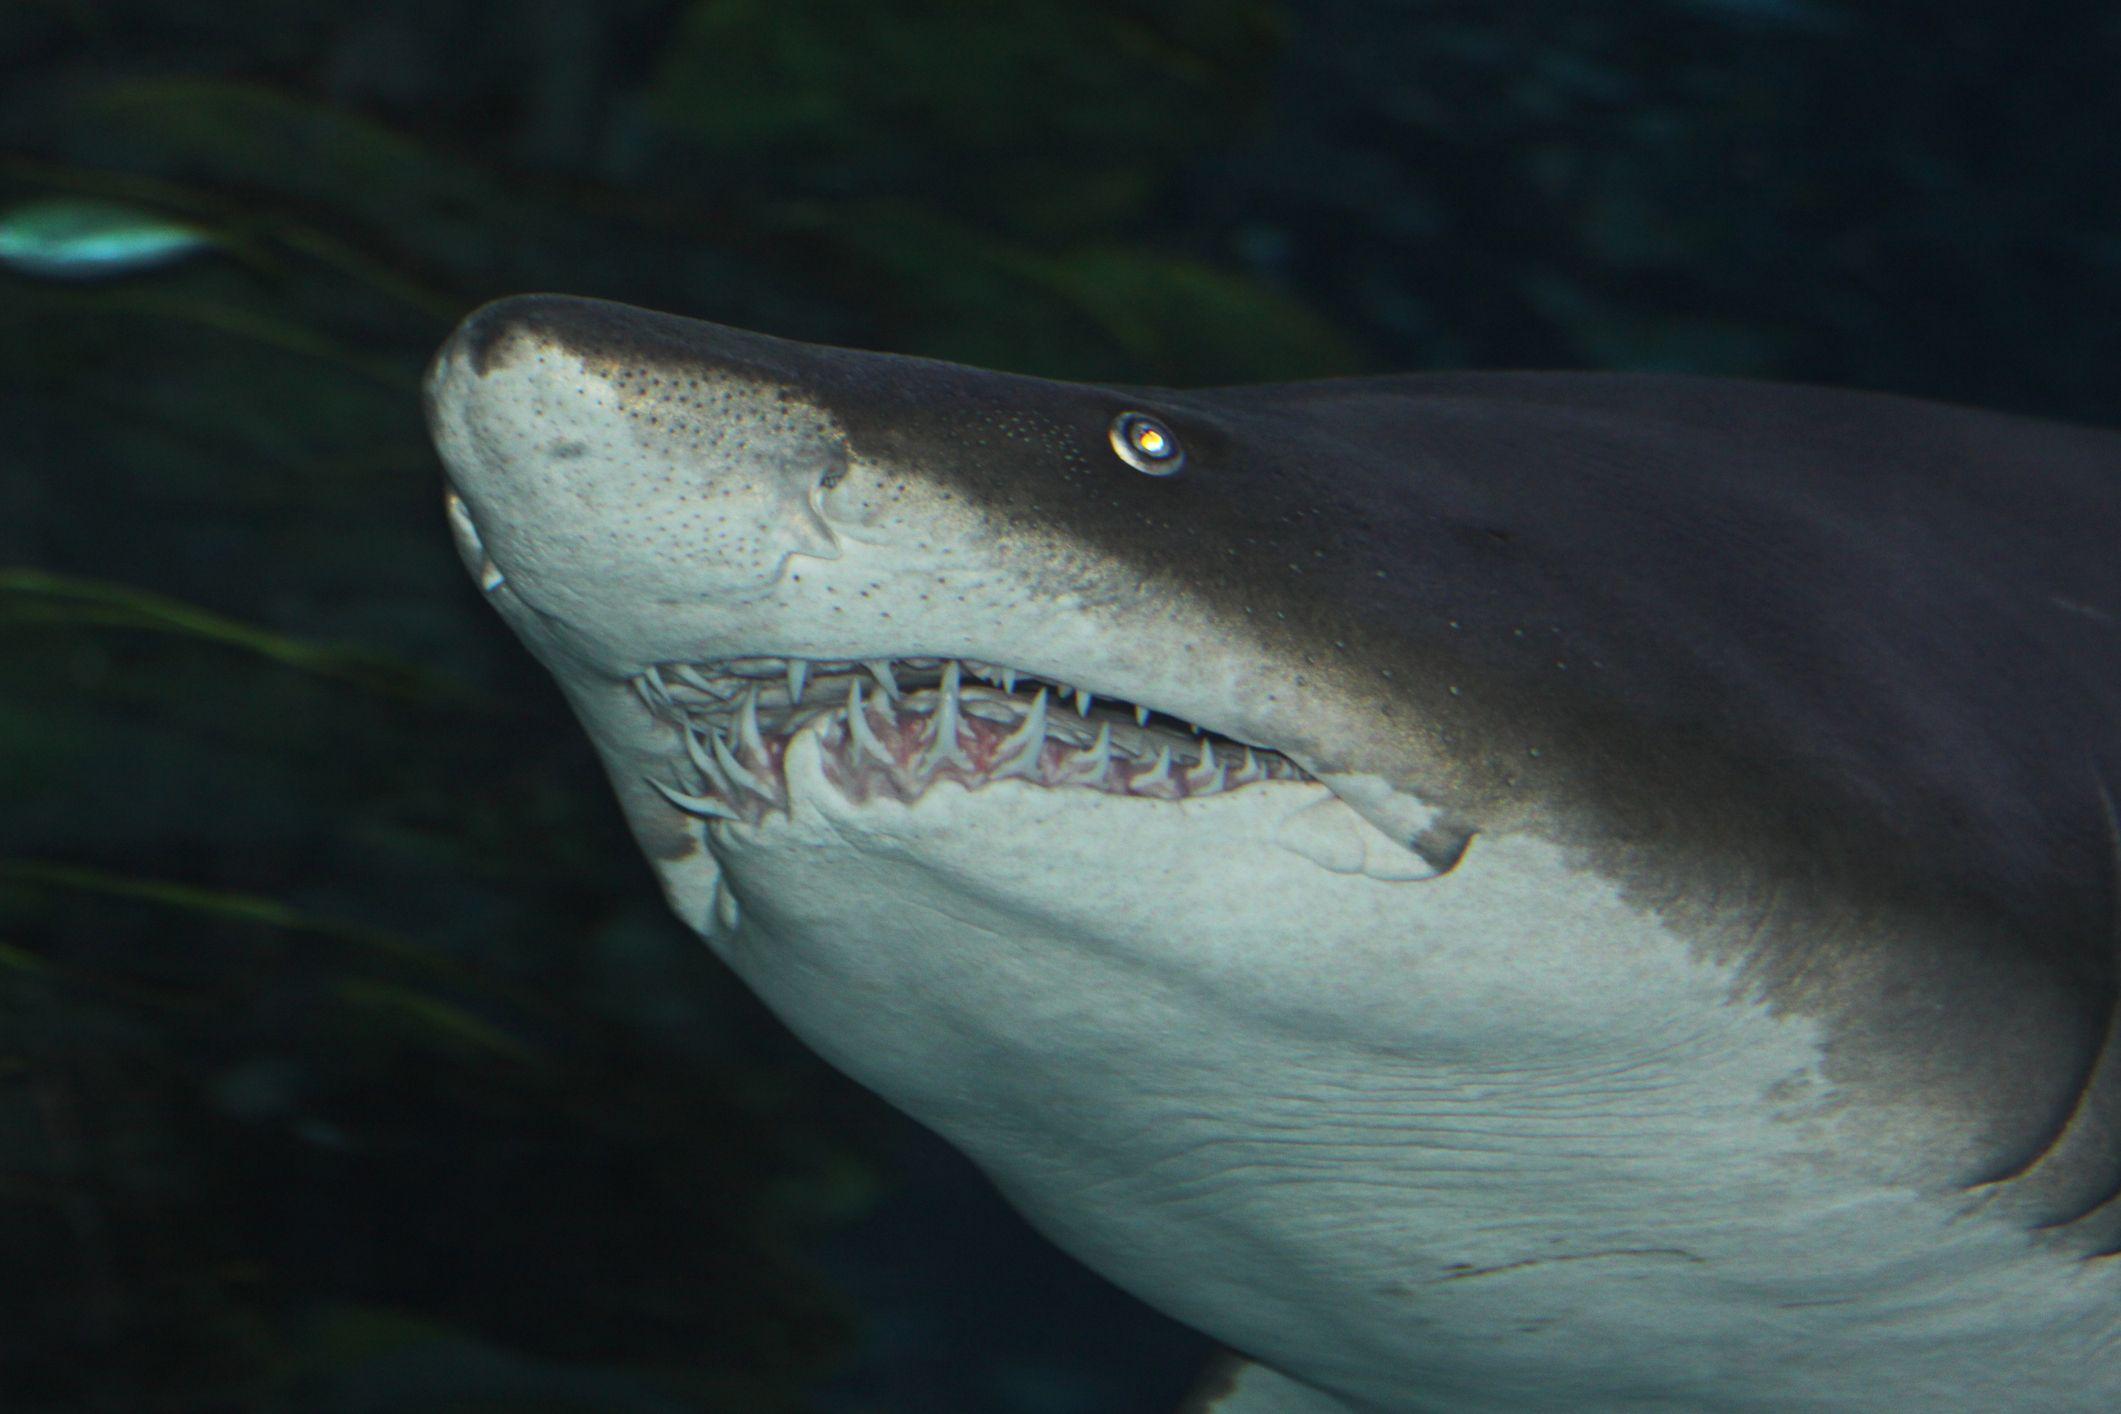 a close-up of sand tiger shark teeth